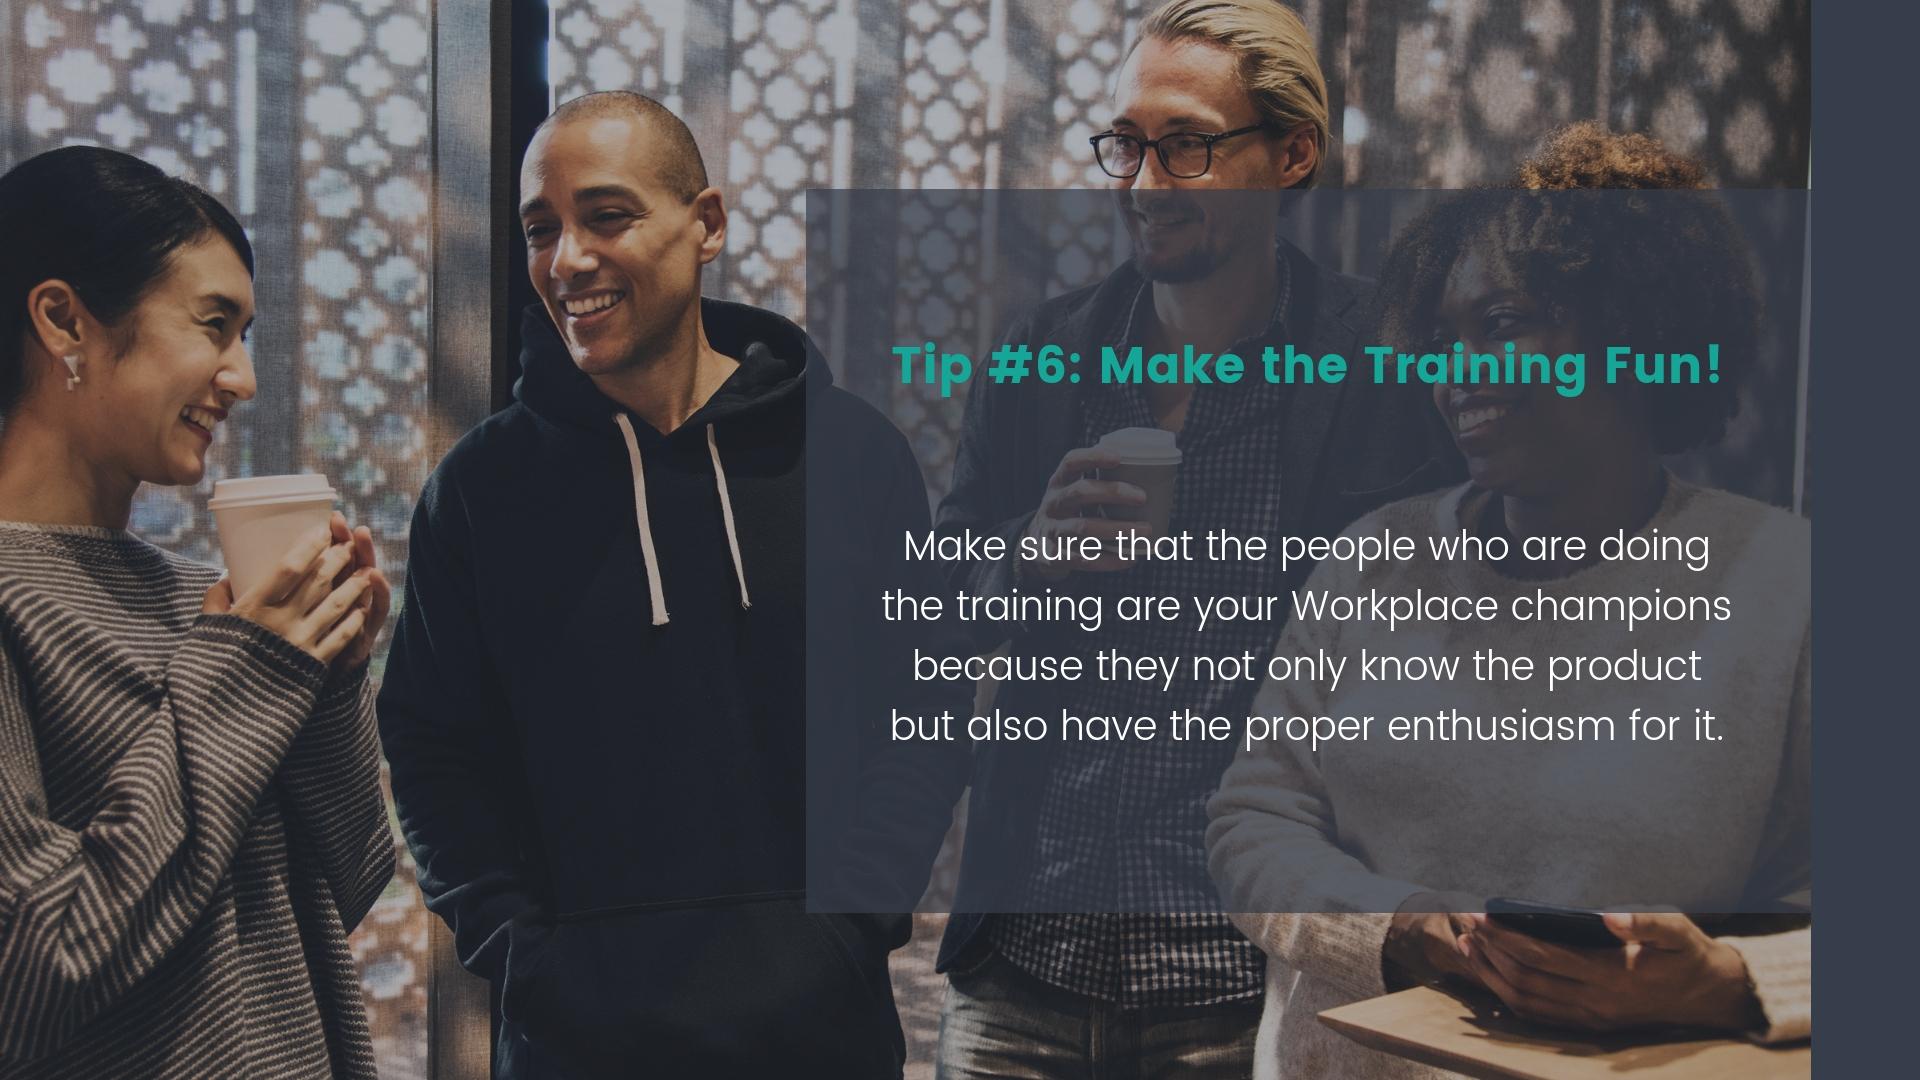 Tip #6: Make the Training Fun!